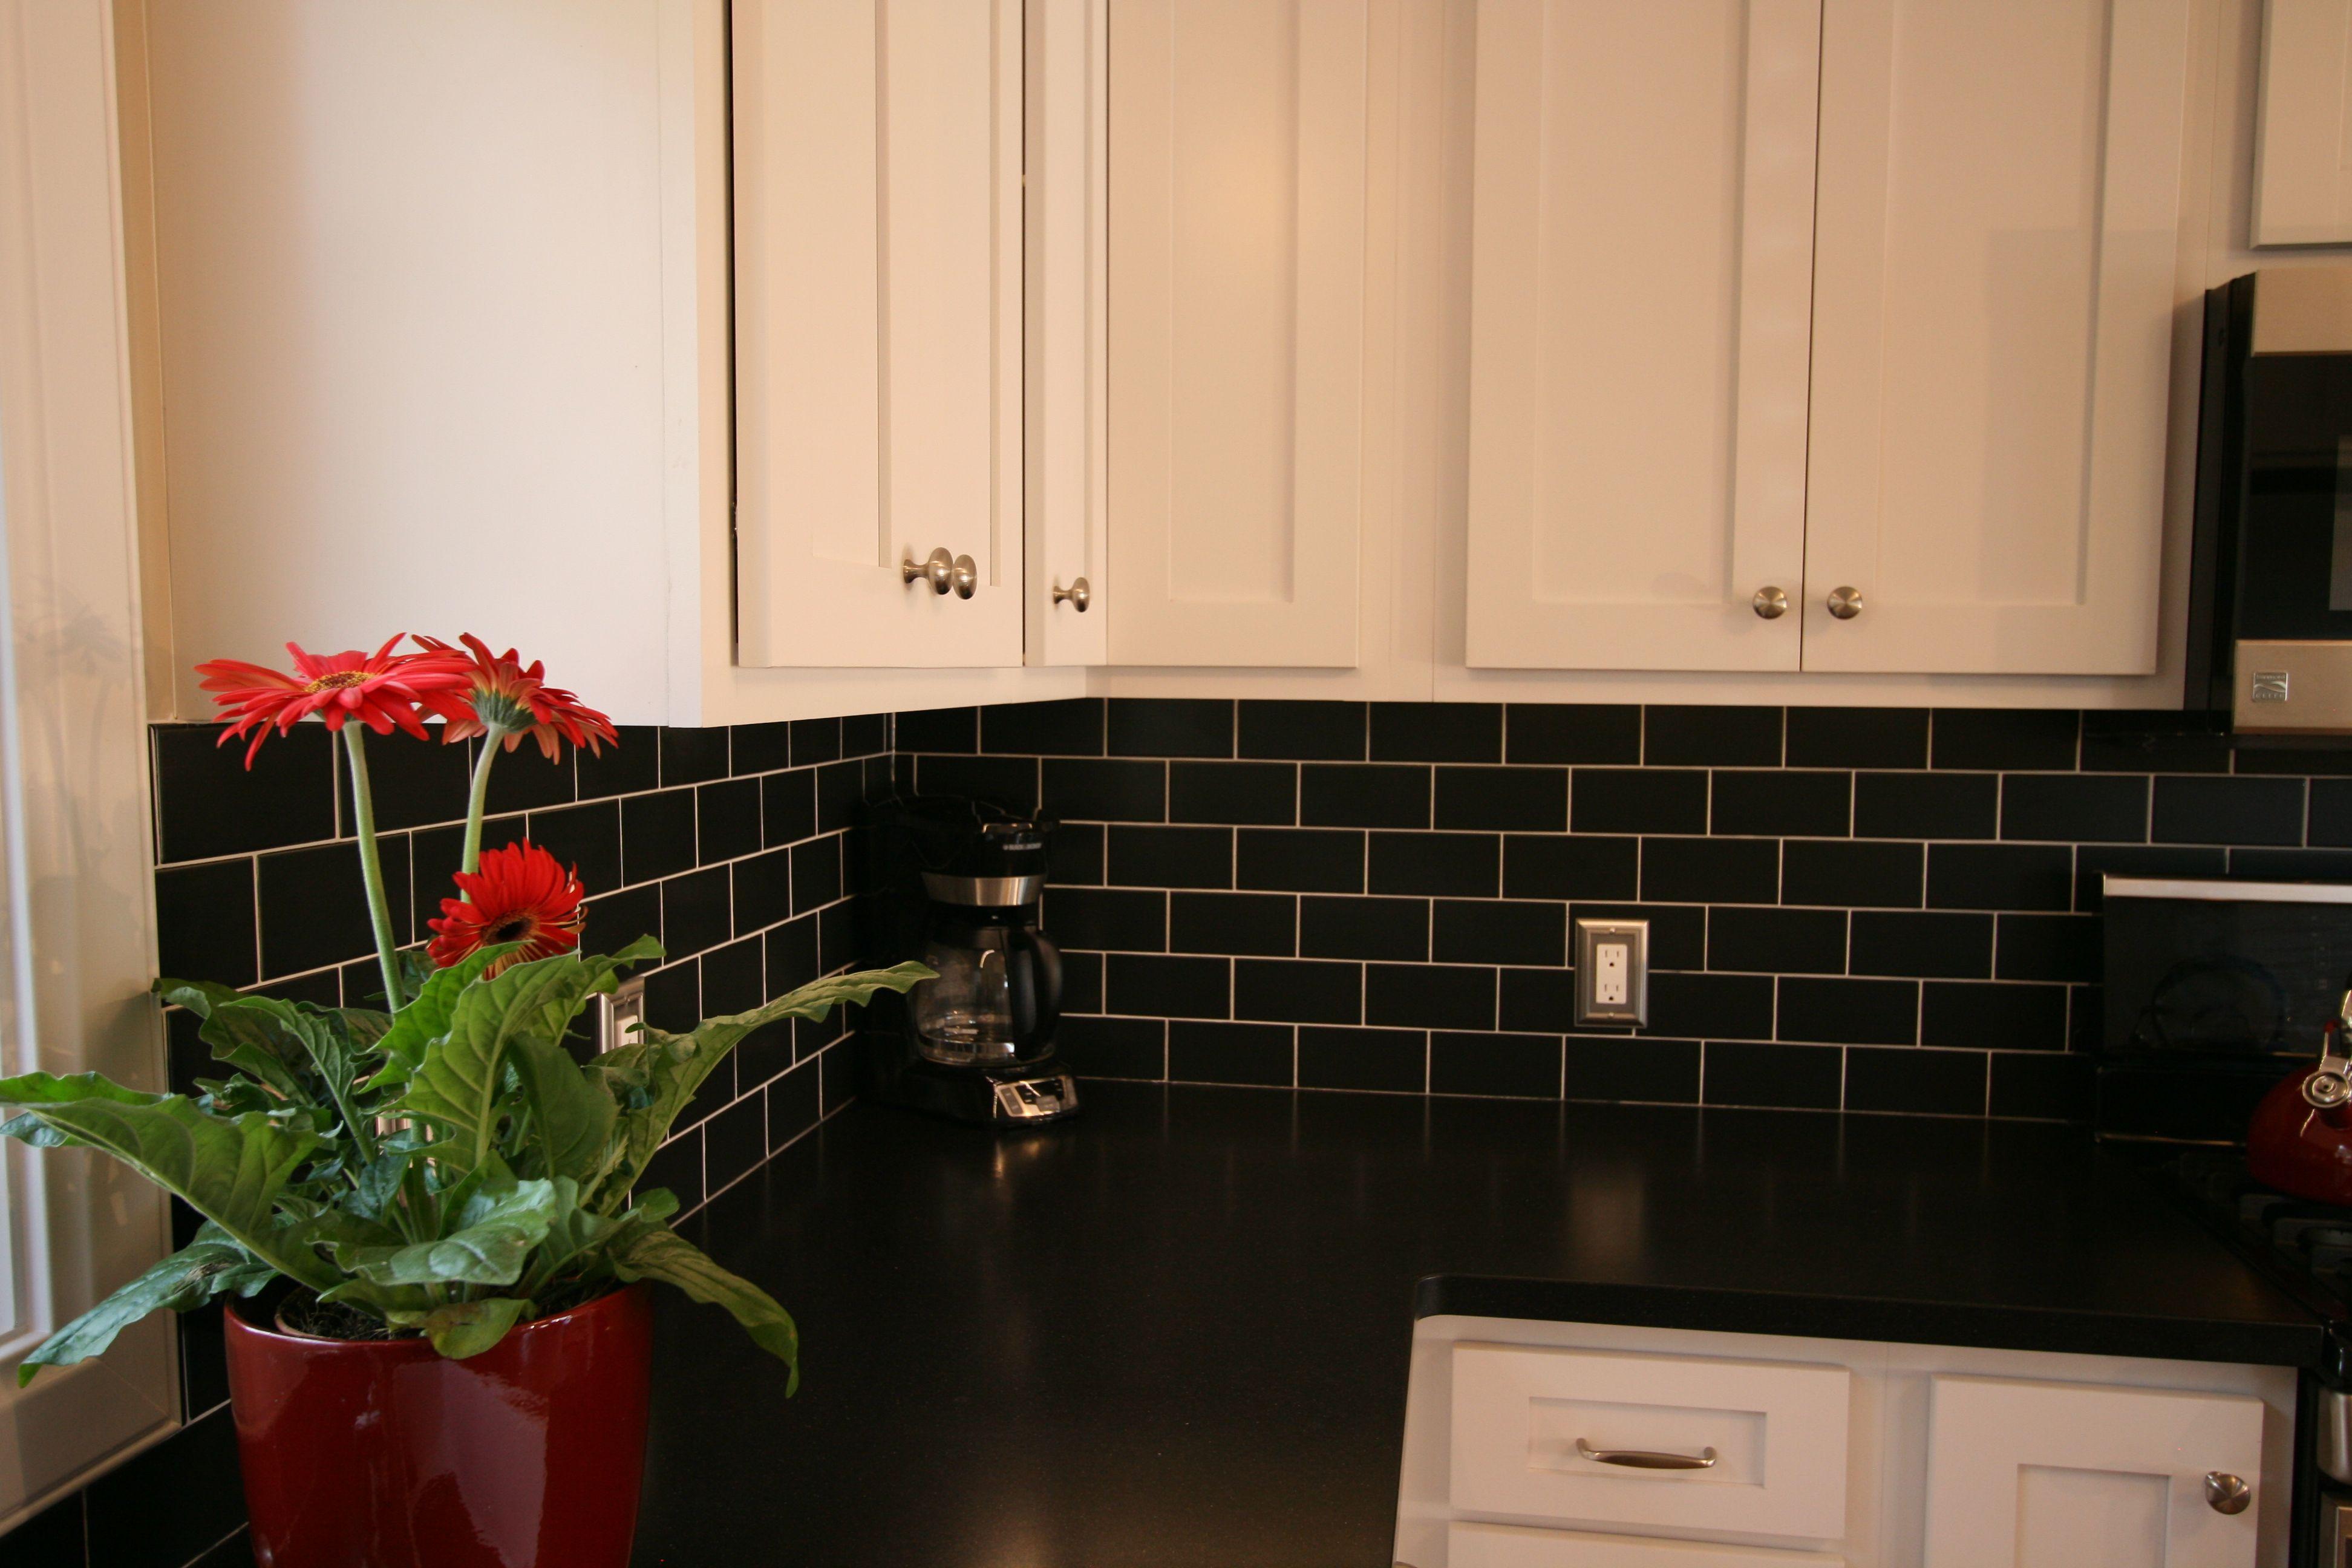 White cabinets black subway tile & black granite countertops